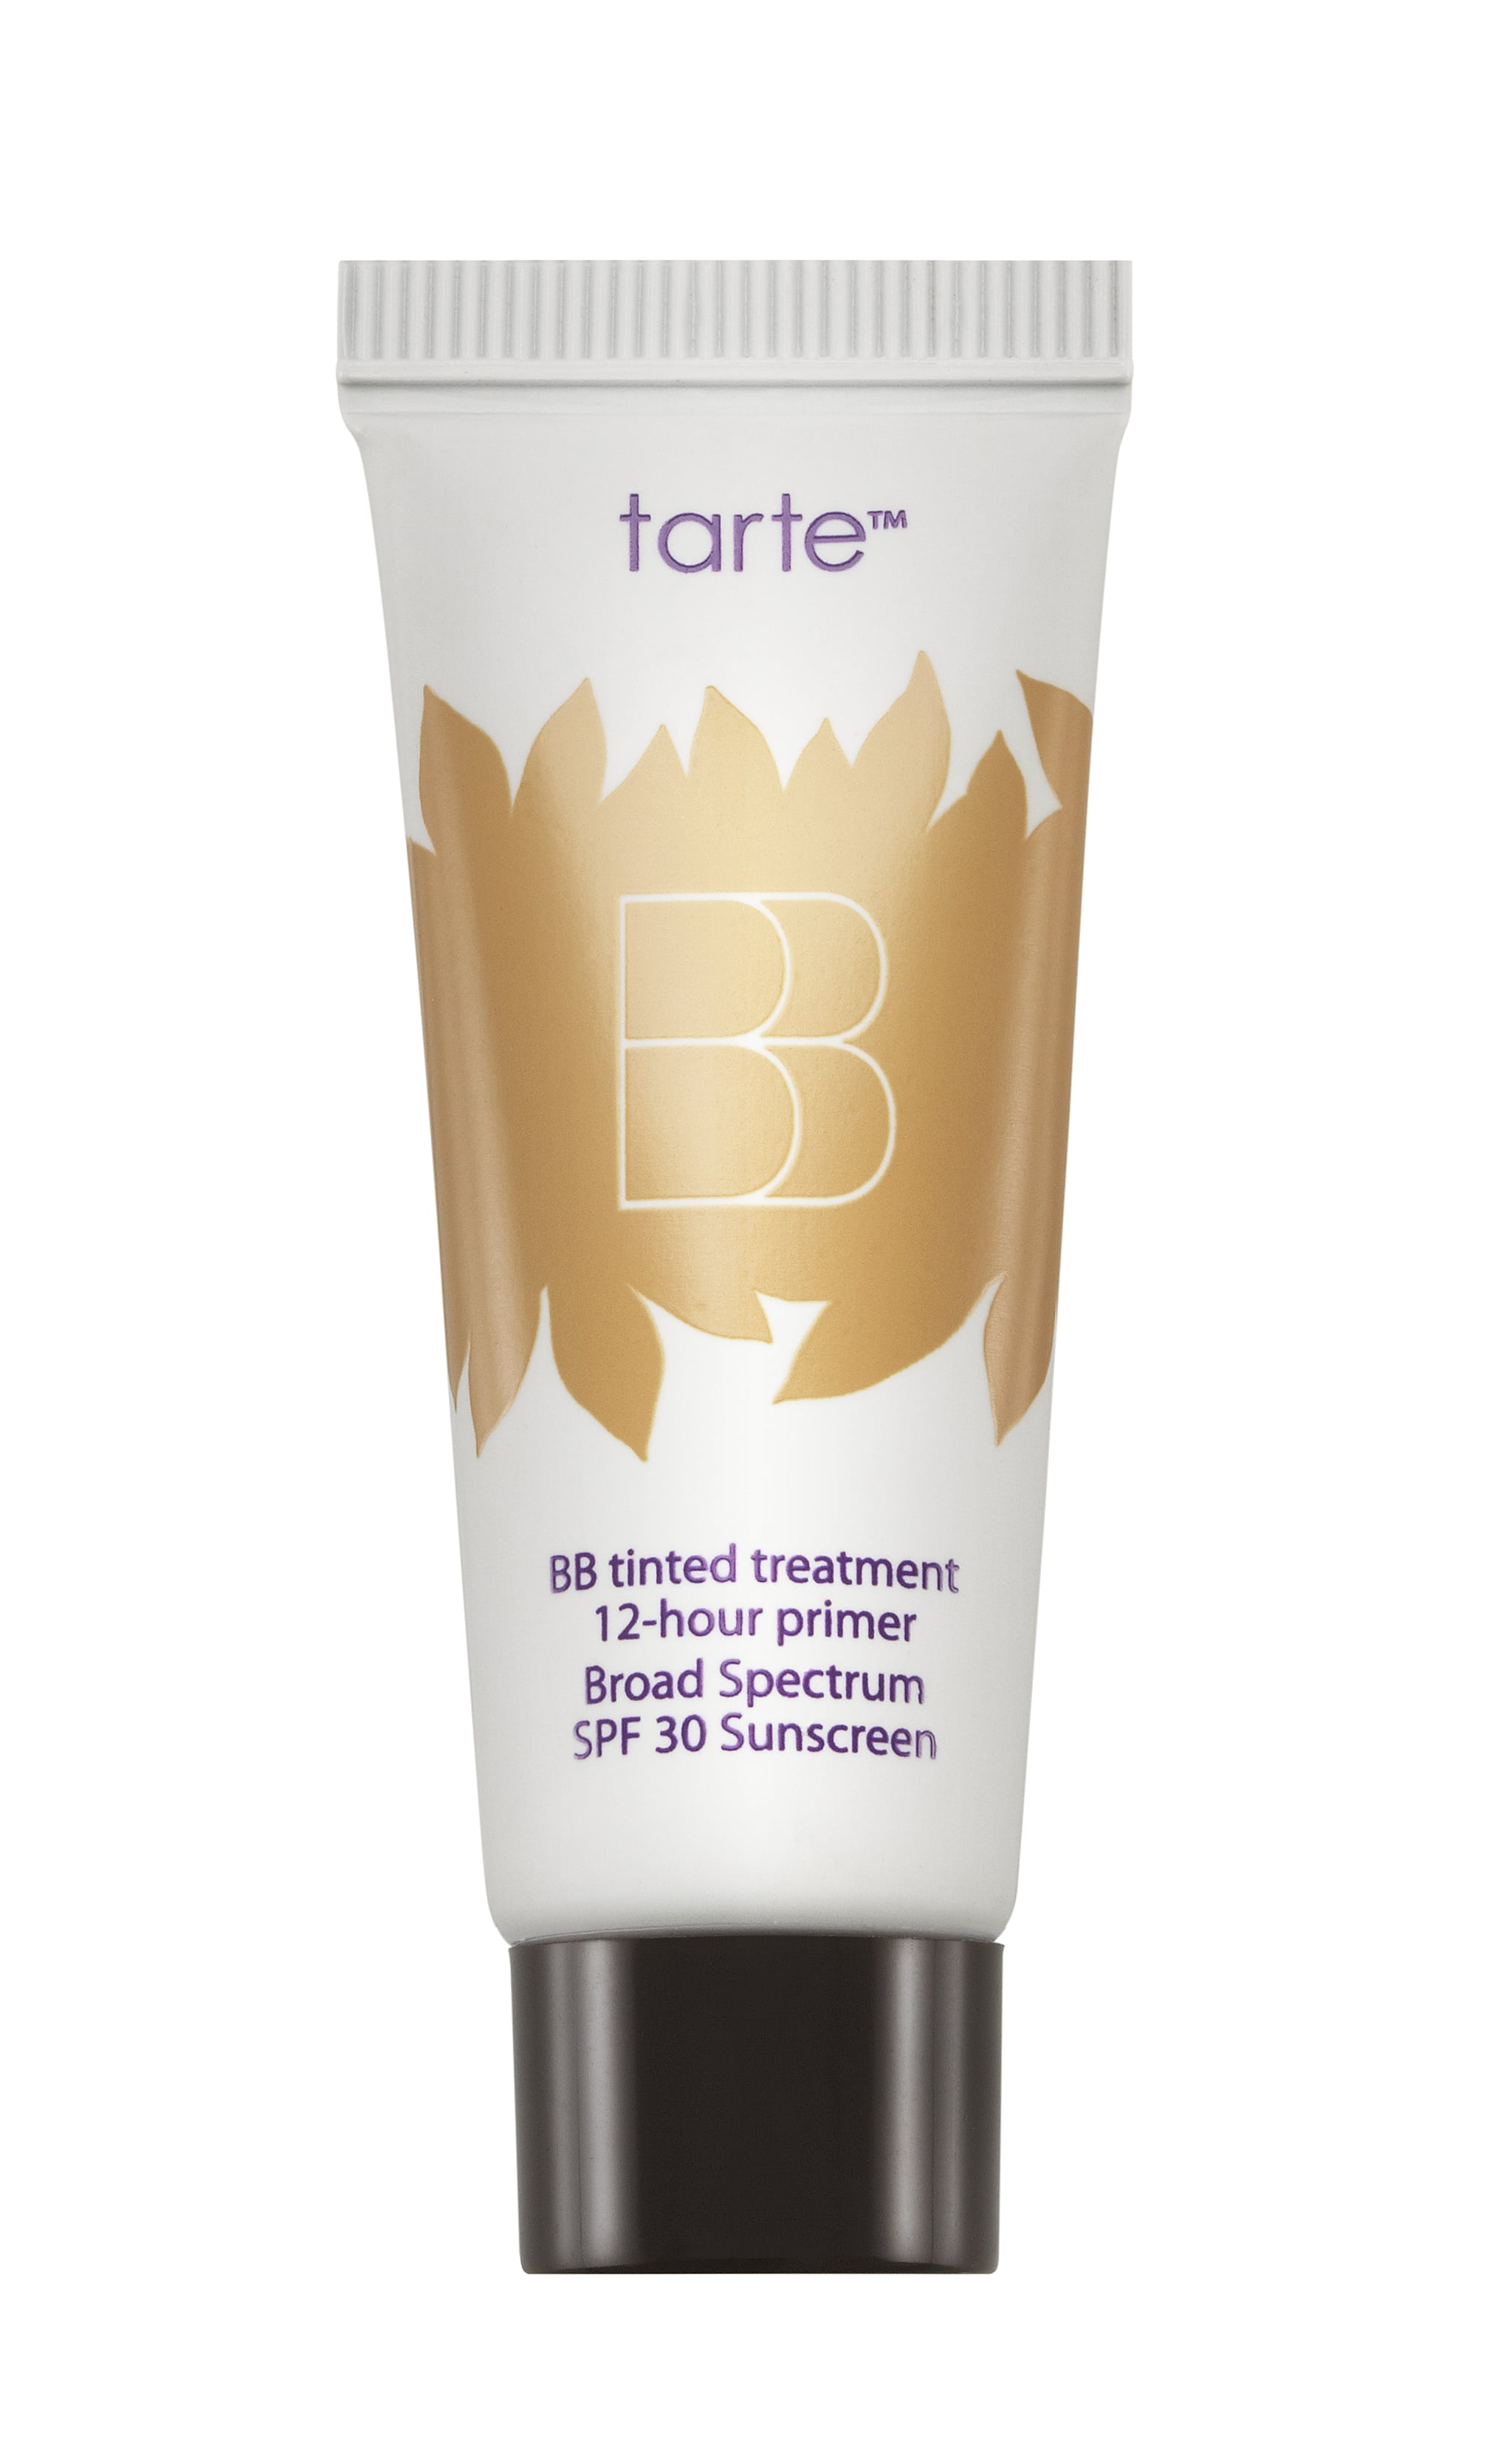 Tarte BB Cream